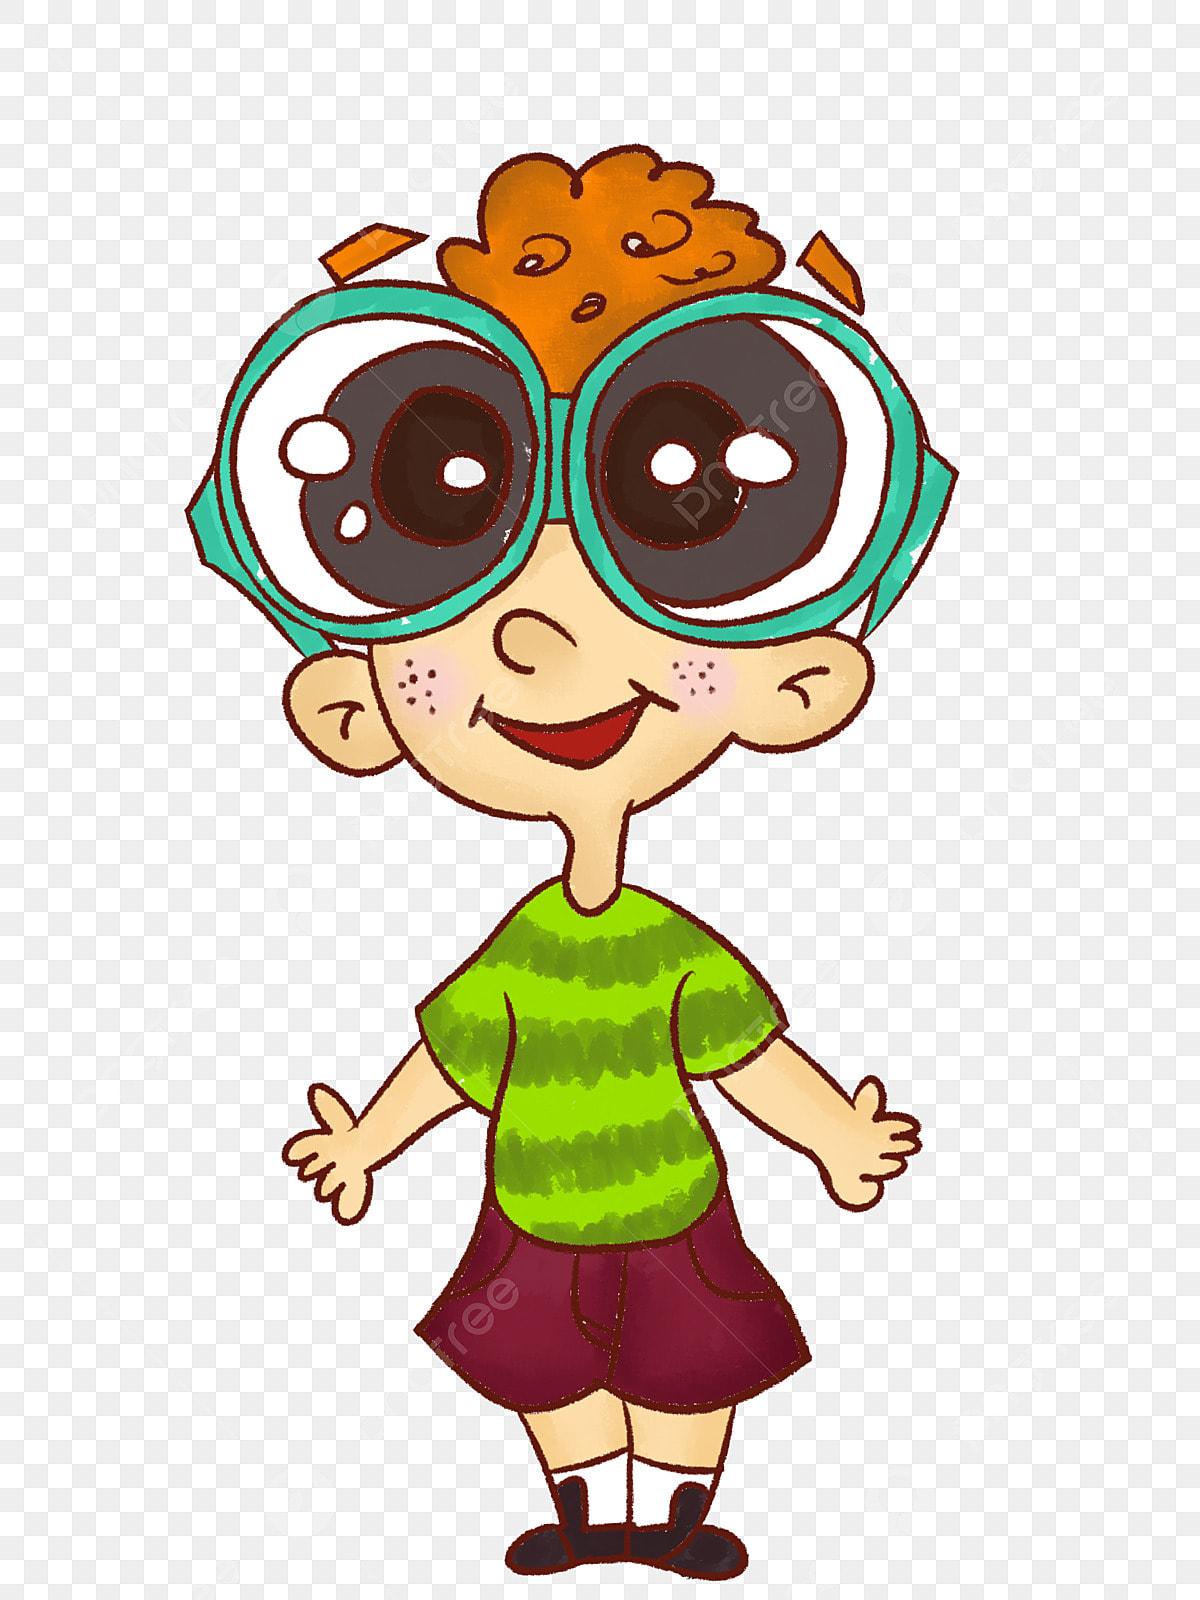 Cute Kid Wearing Cowboy Hat Cartoon Vector Clipart - FriendlyStock   New  halloween costumes, Cute kids, Cartoons vector